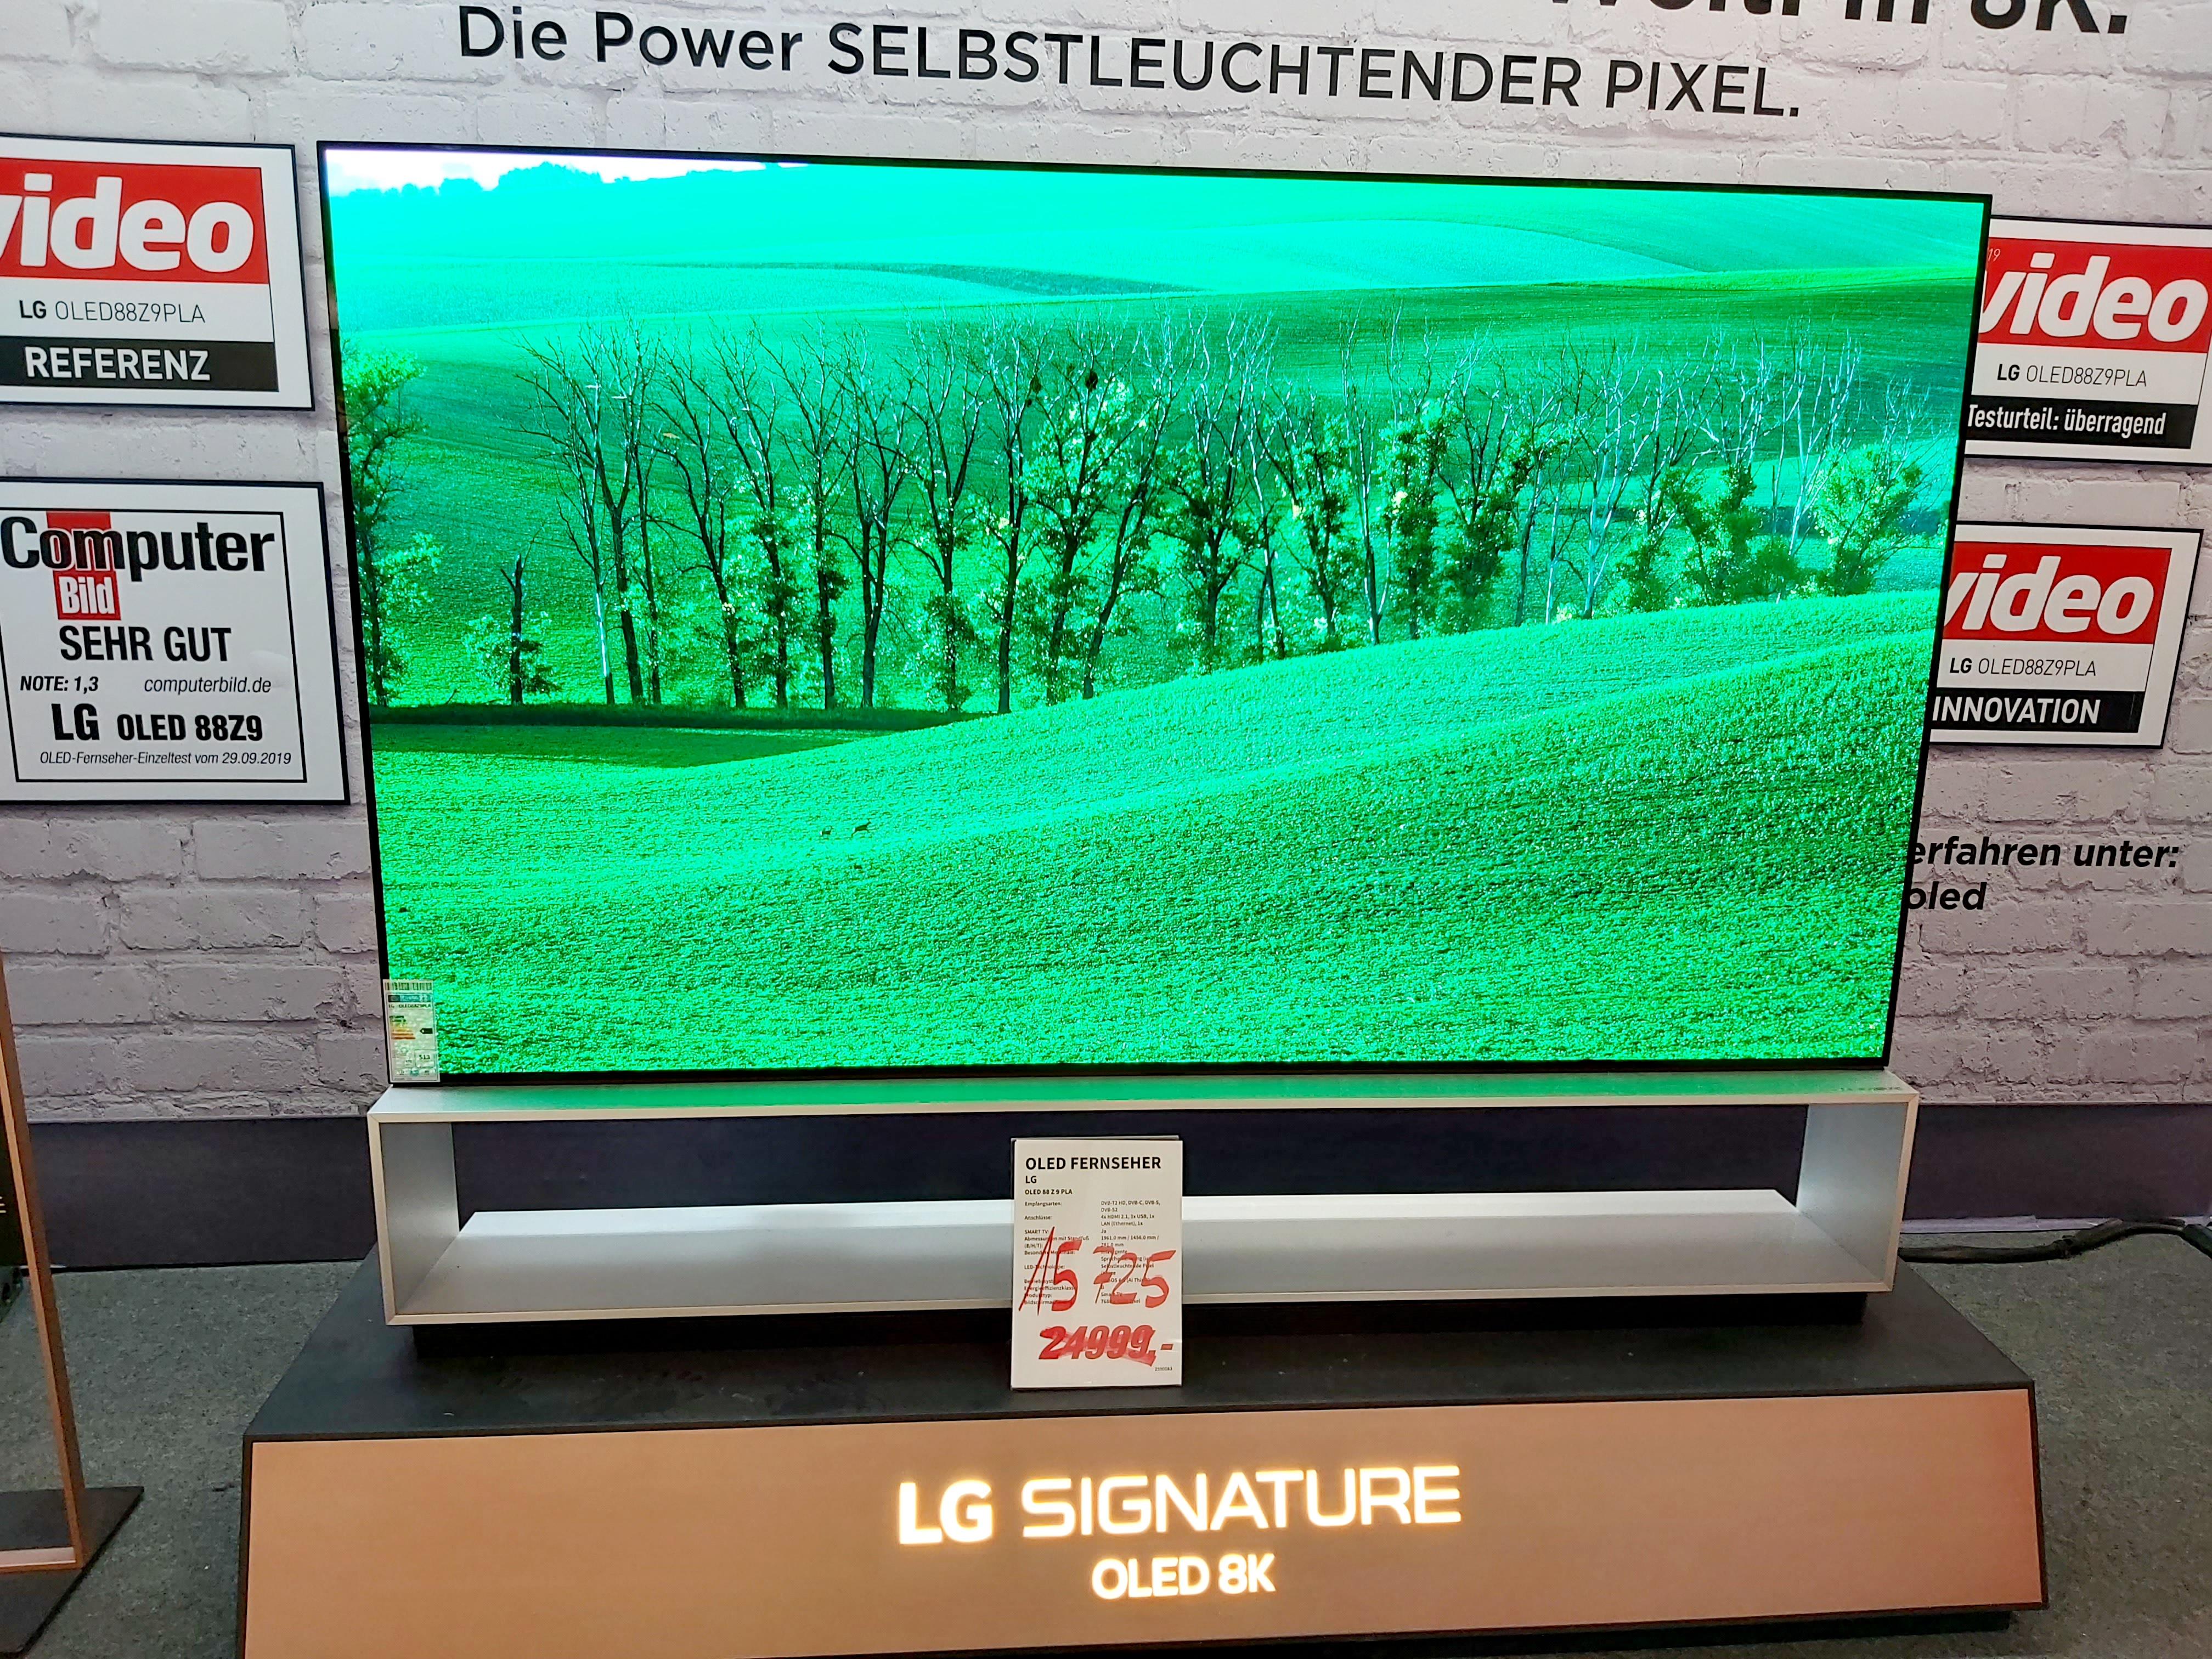 Media Markt Wiesbaden - LG OLED 88 Z 9 PLA Signature 8K 88 Zoll TV Fernseher